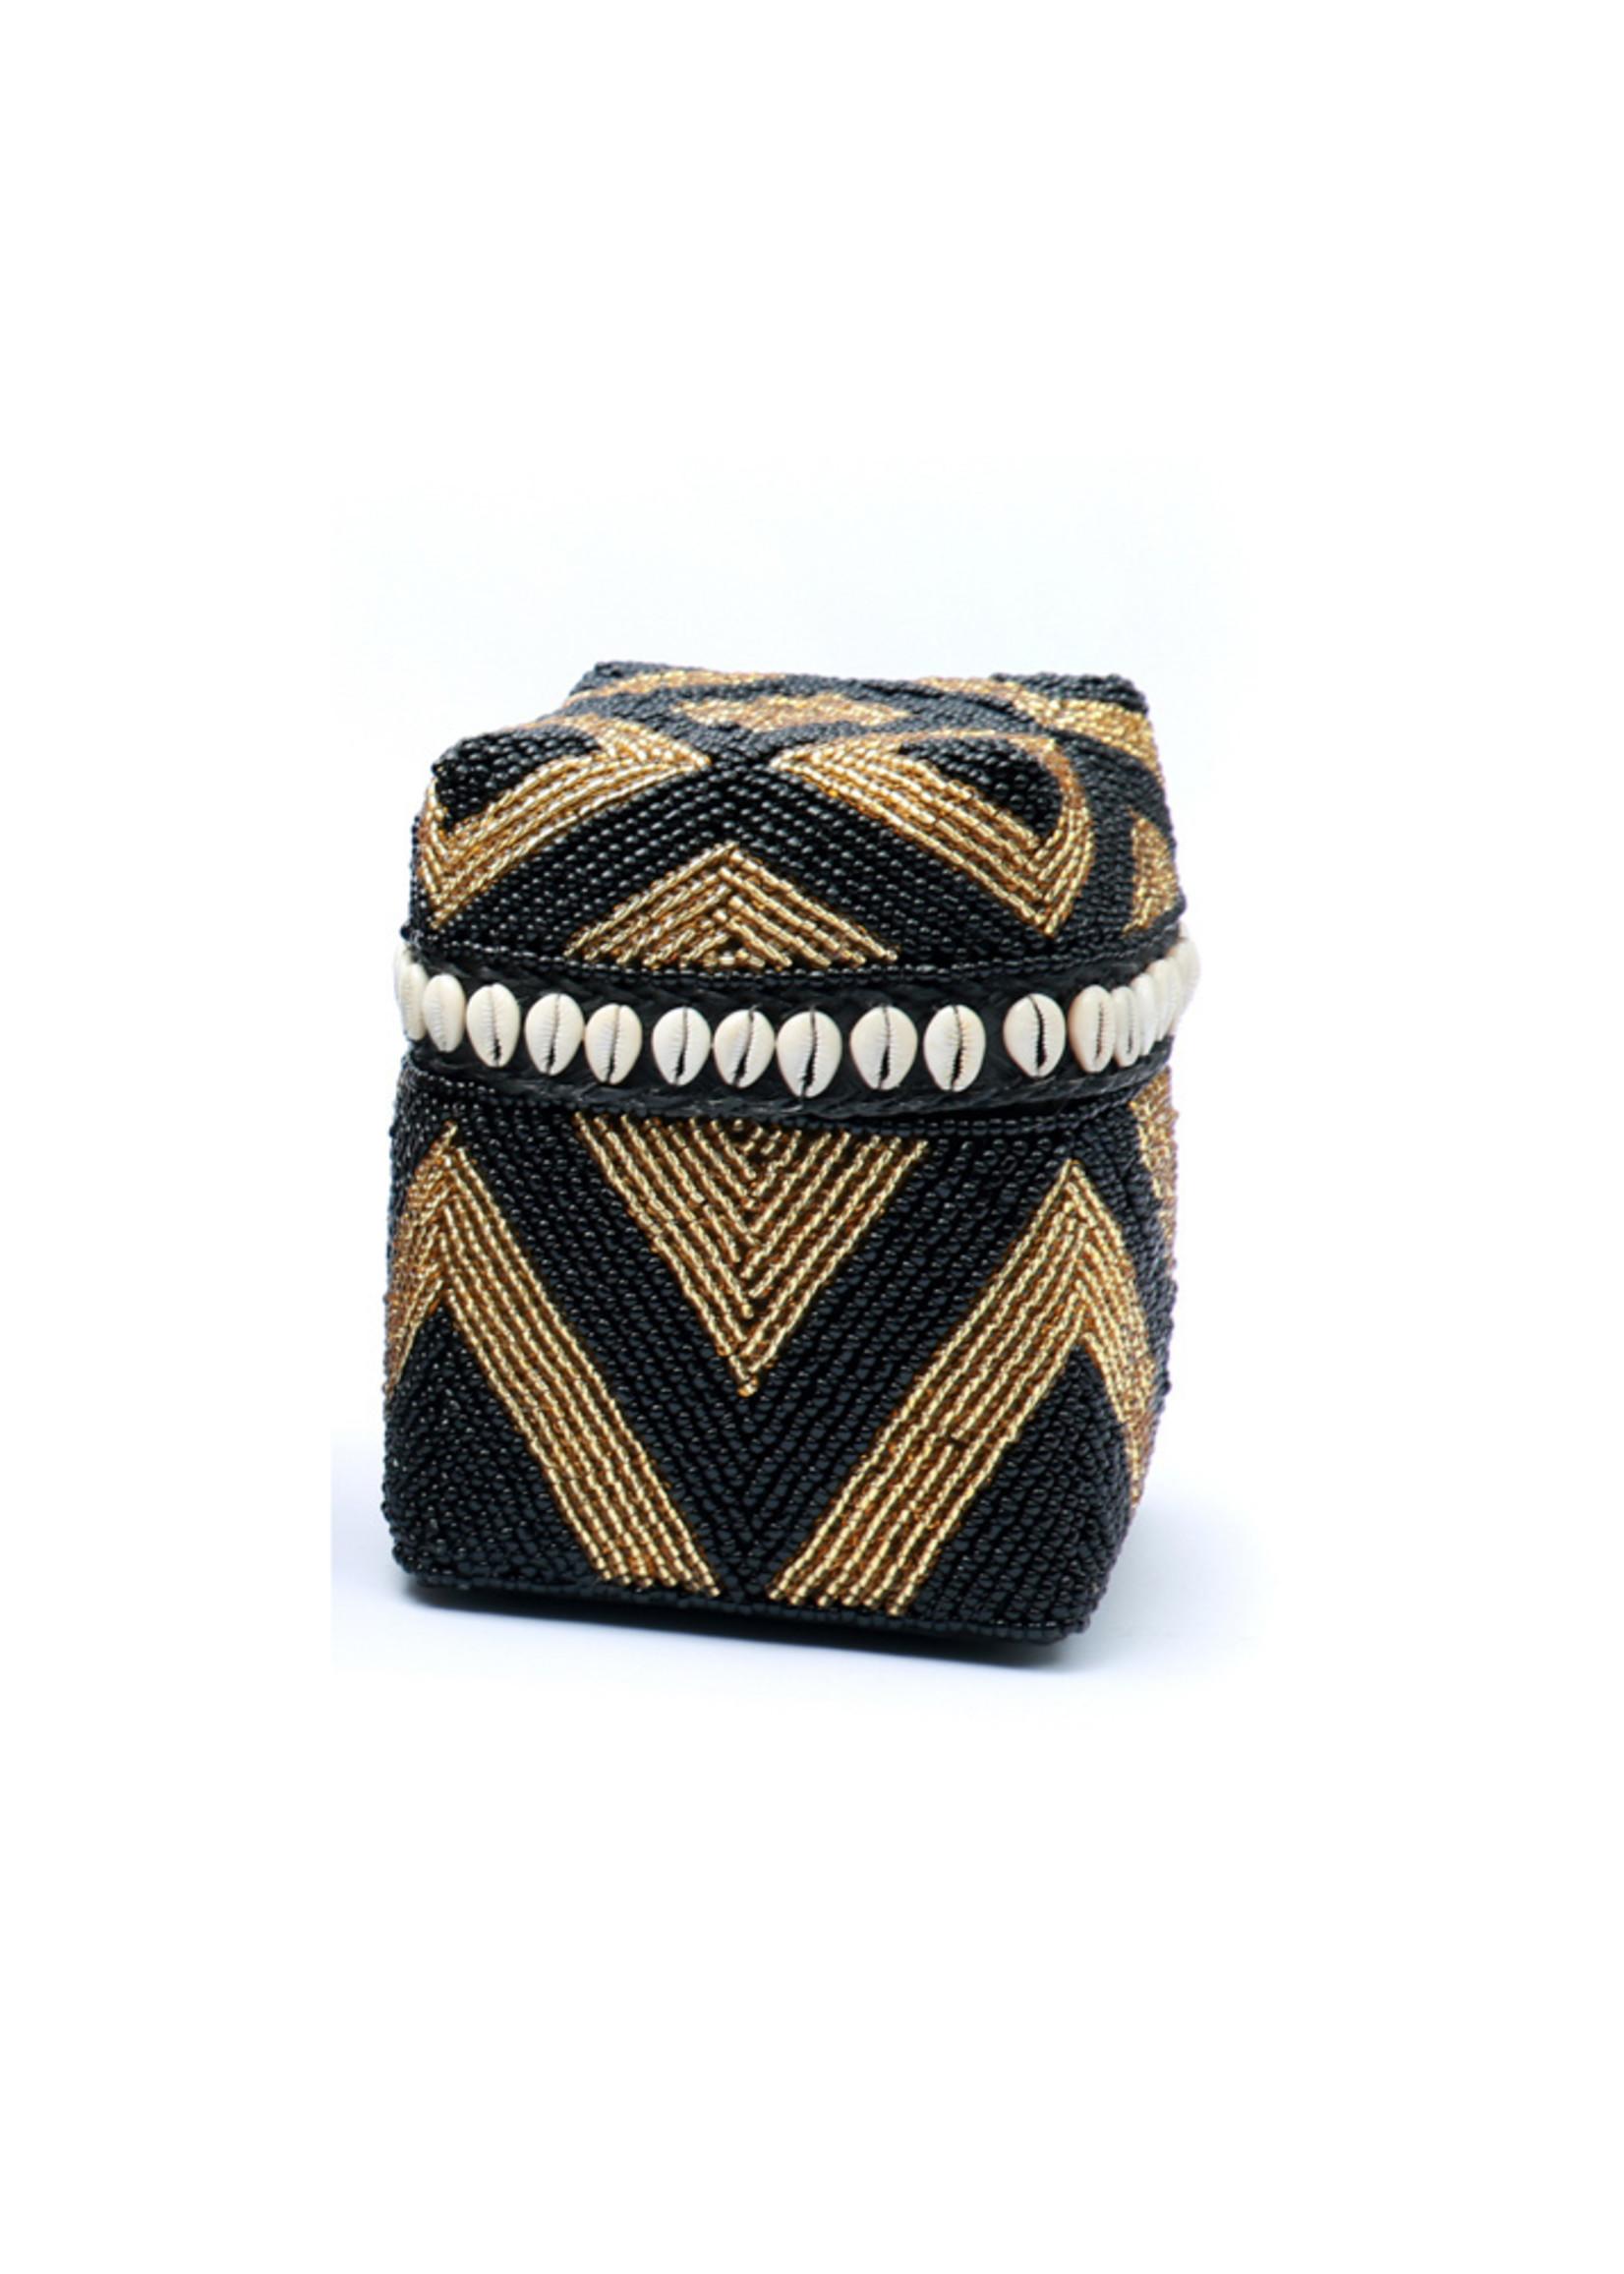 The Beaded Basket Cowrie Diamond High - Black Gold - S